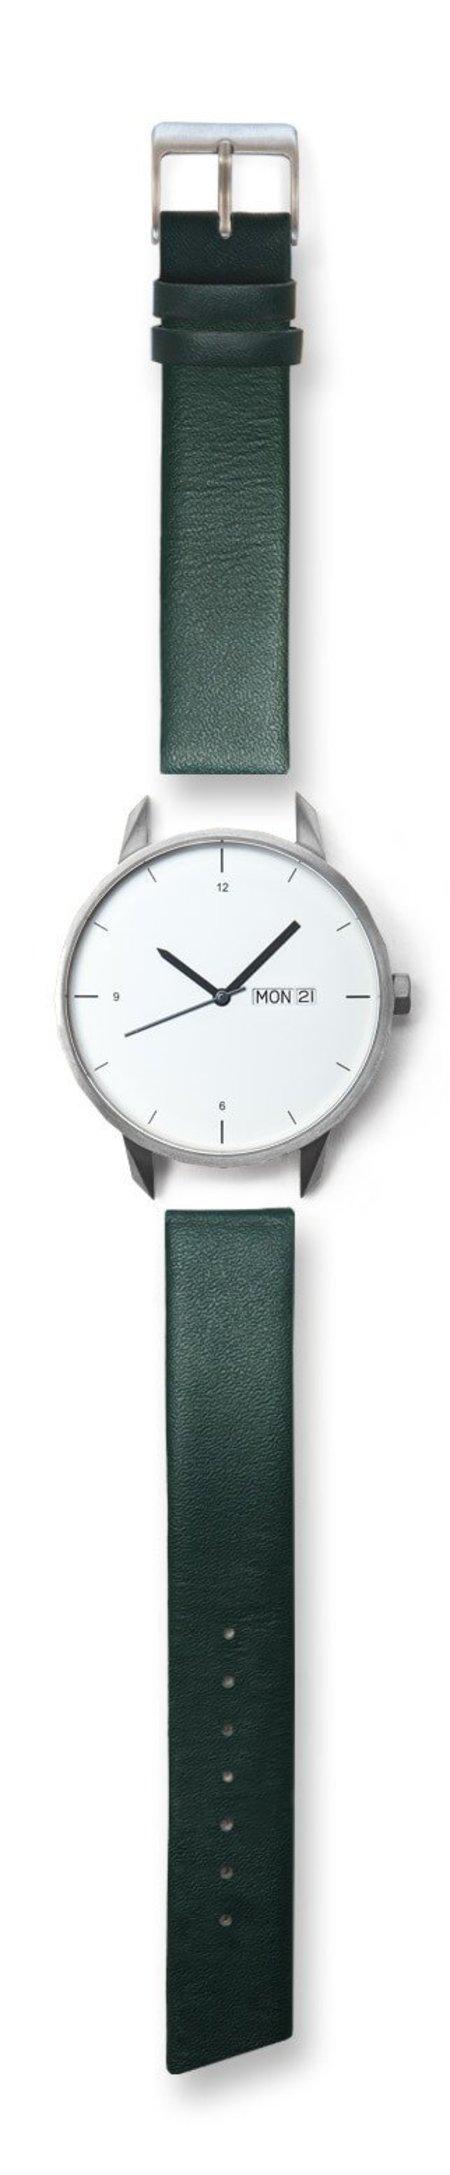 Unisex Tinker Watches 42mm Silver Watch Green Strap